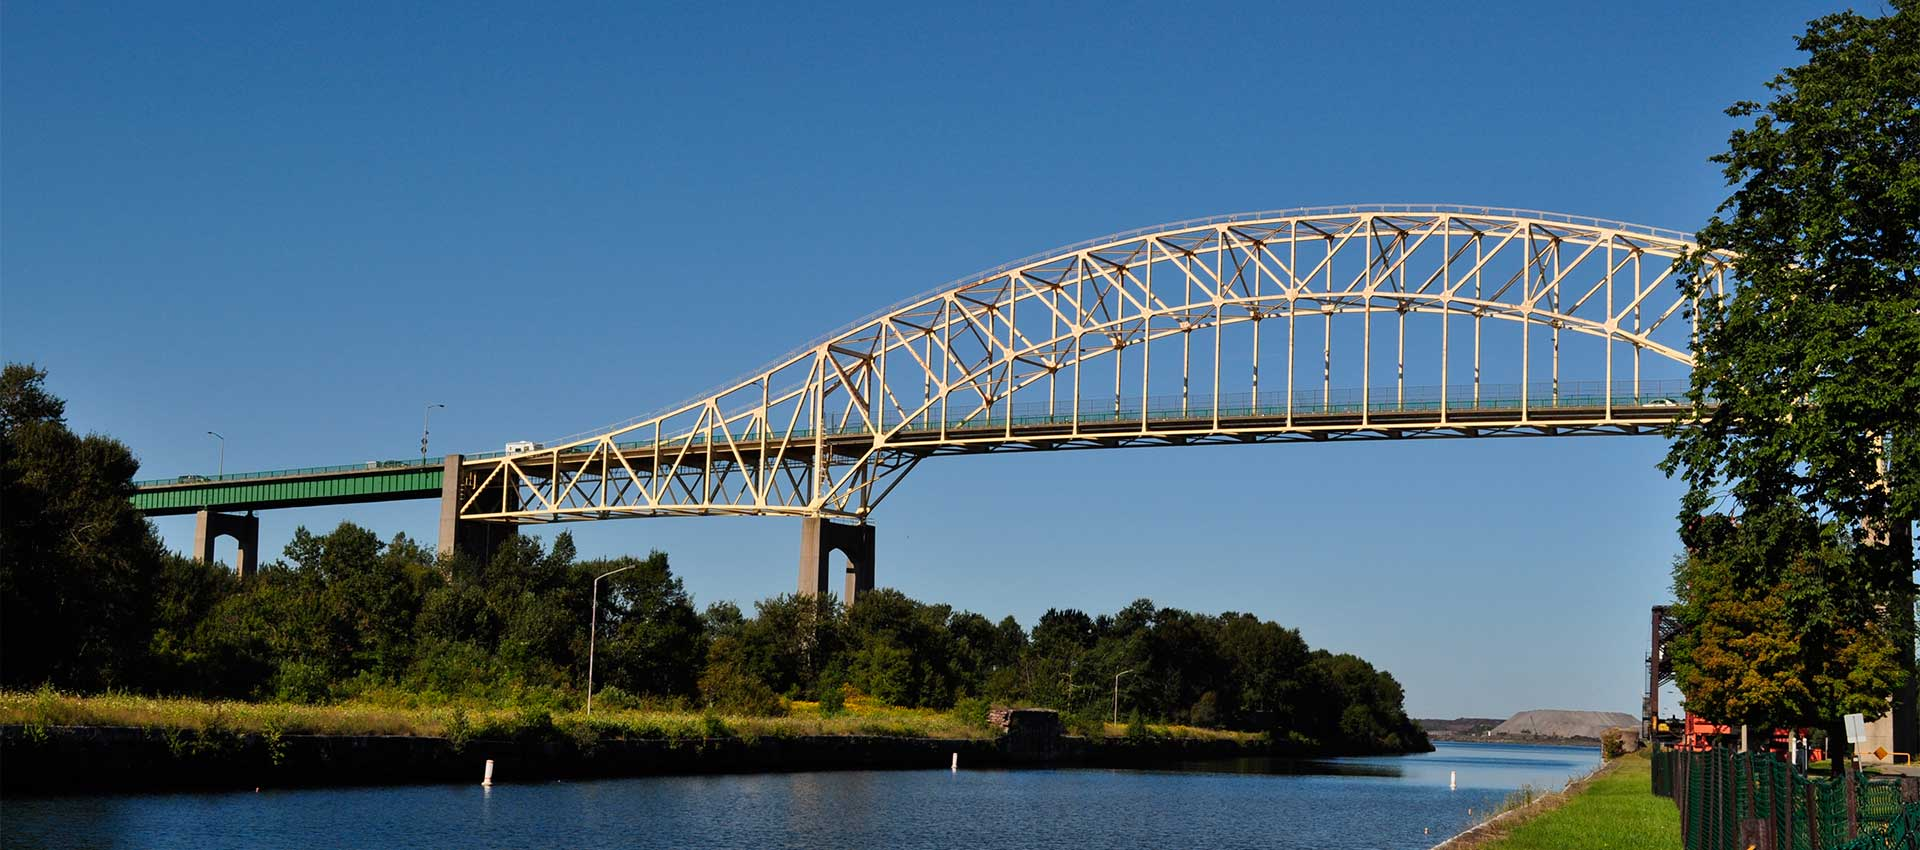 ssm-bridge